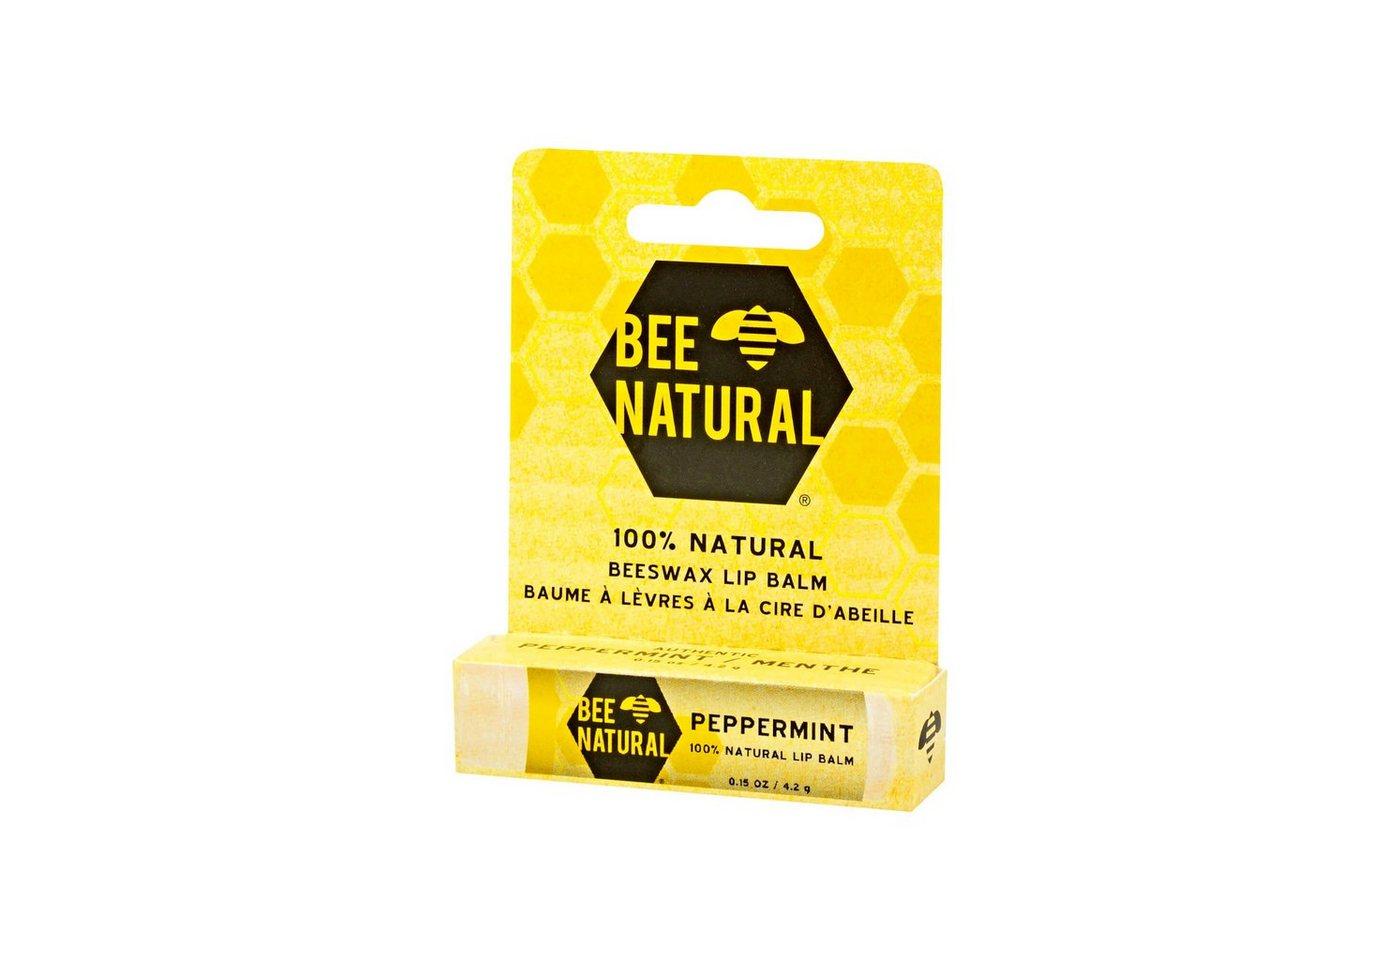 Bee Natural Lippenpflegestift Pfefferminz, 4.25 g